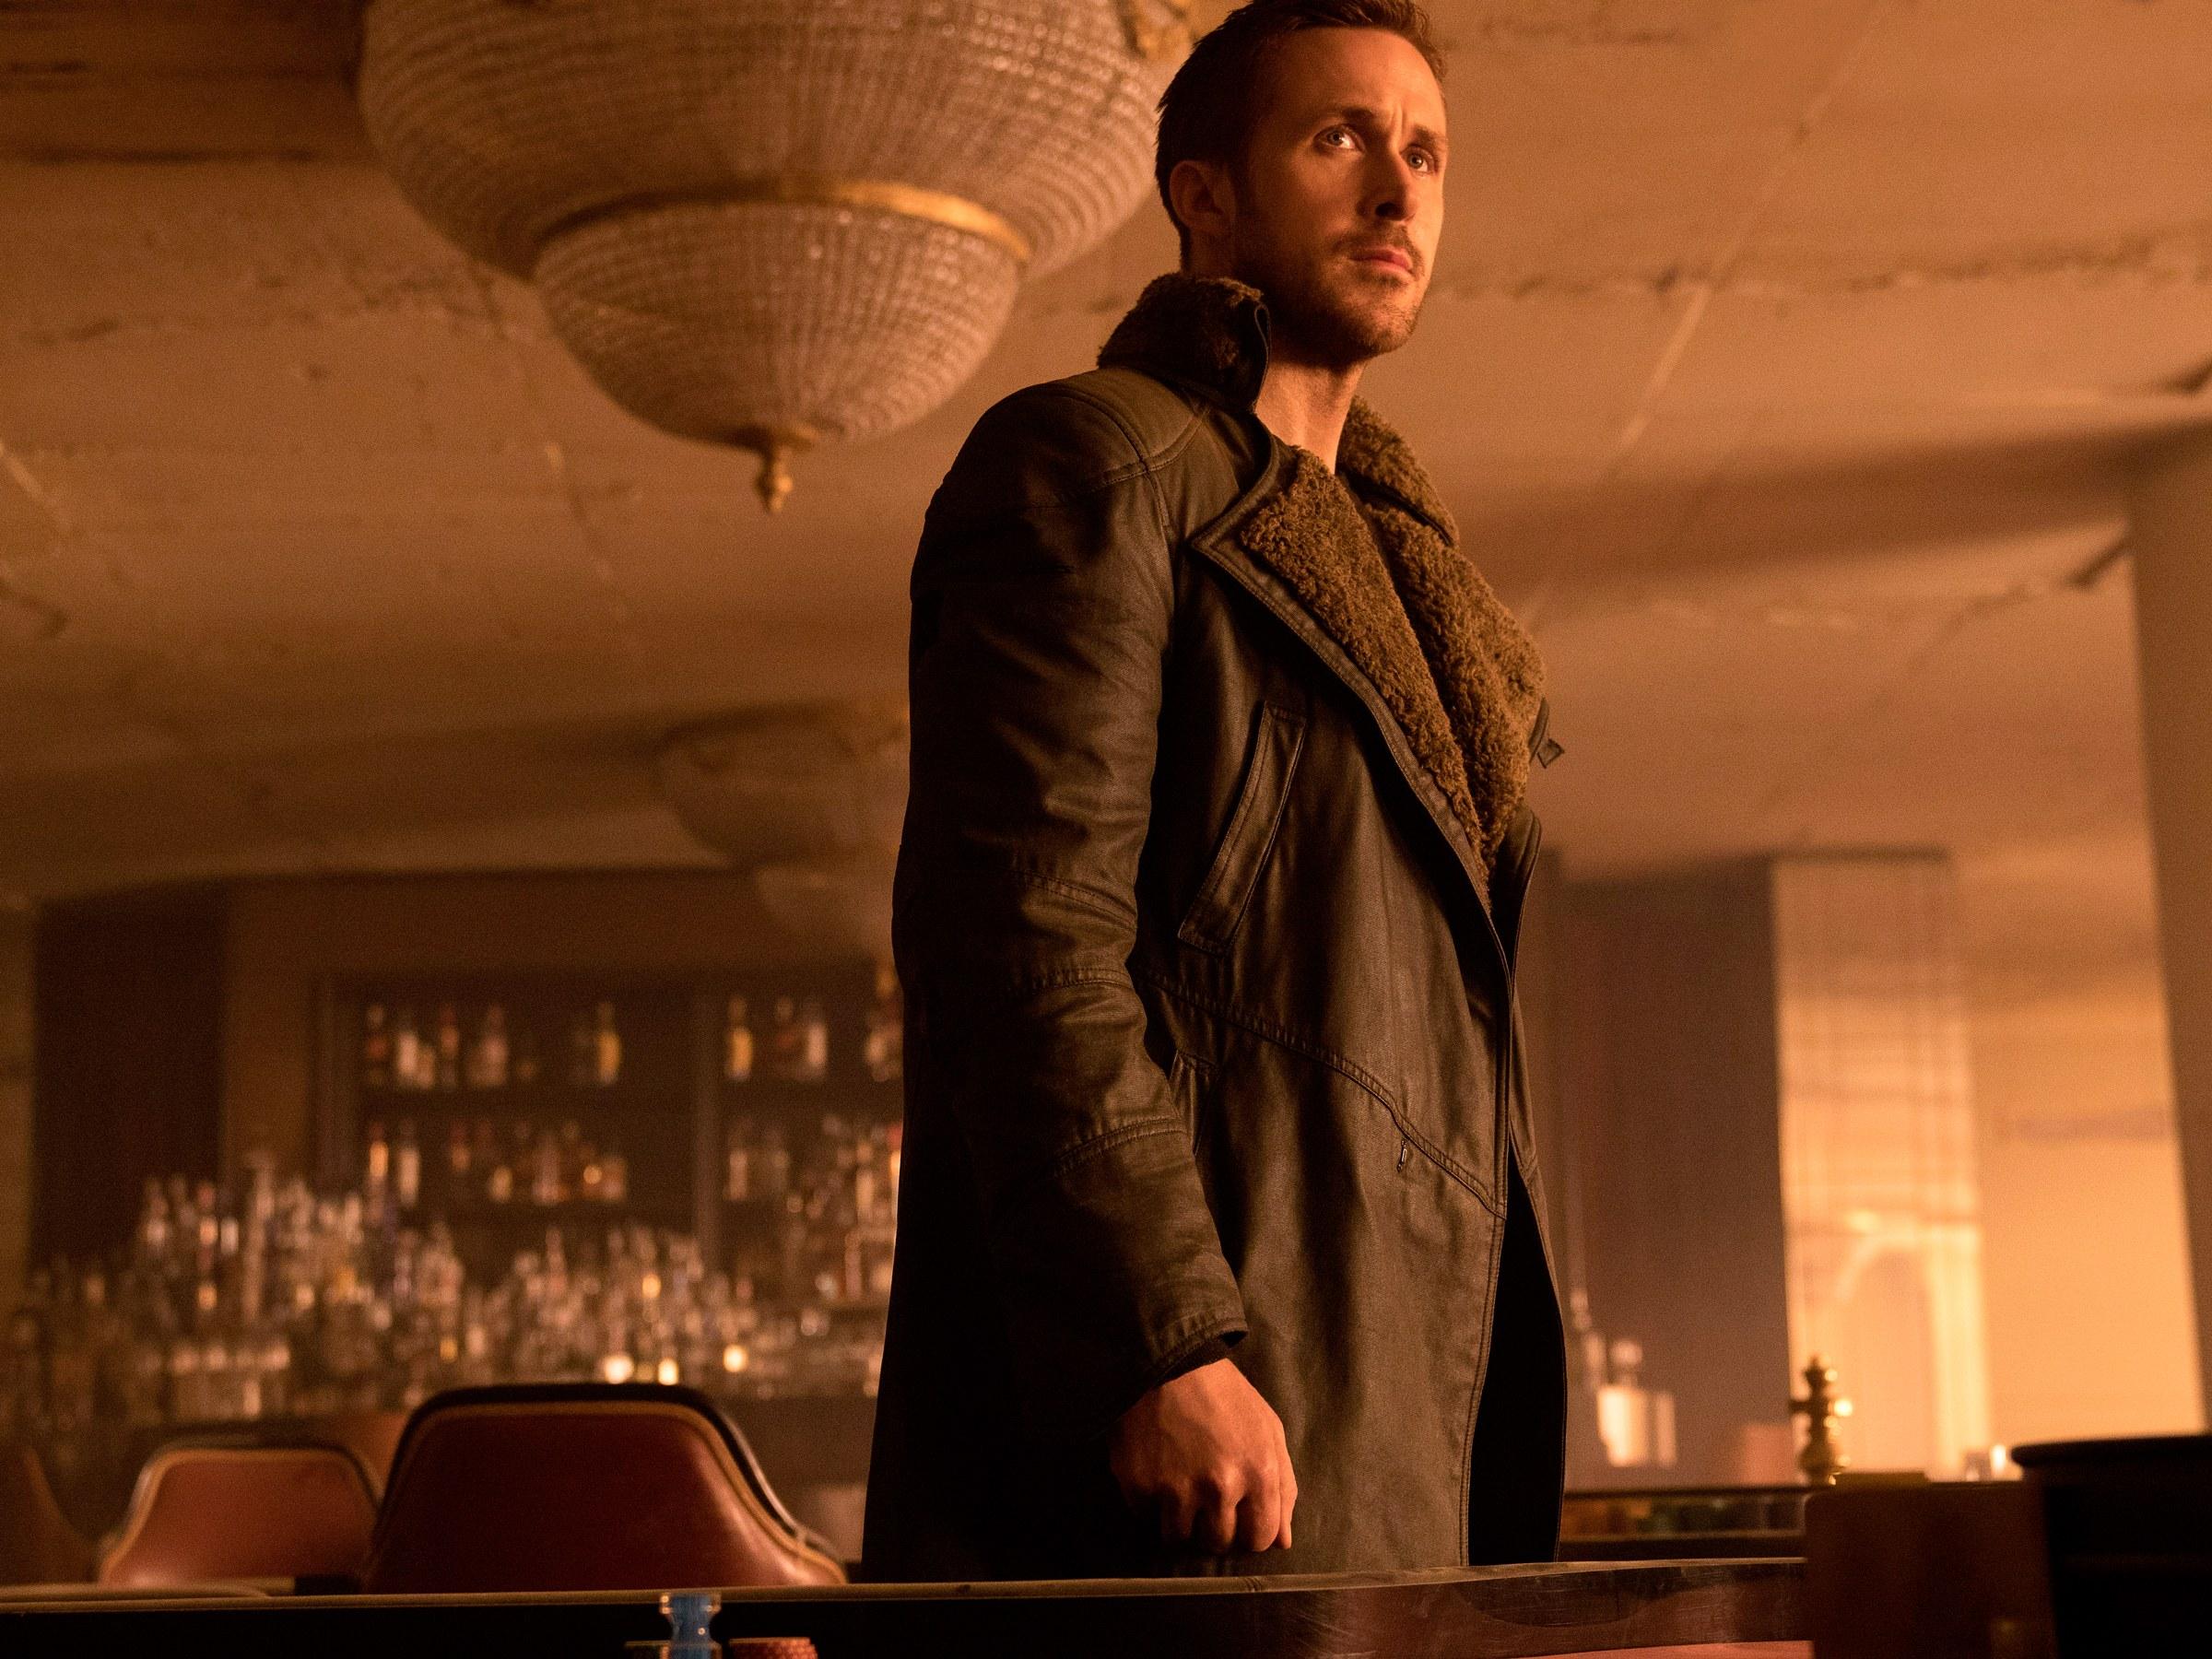 bladerunner ta Filmmaker of the Year Denis Villeneuve on Crafting the Essential Sequel